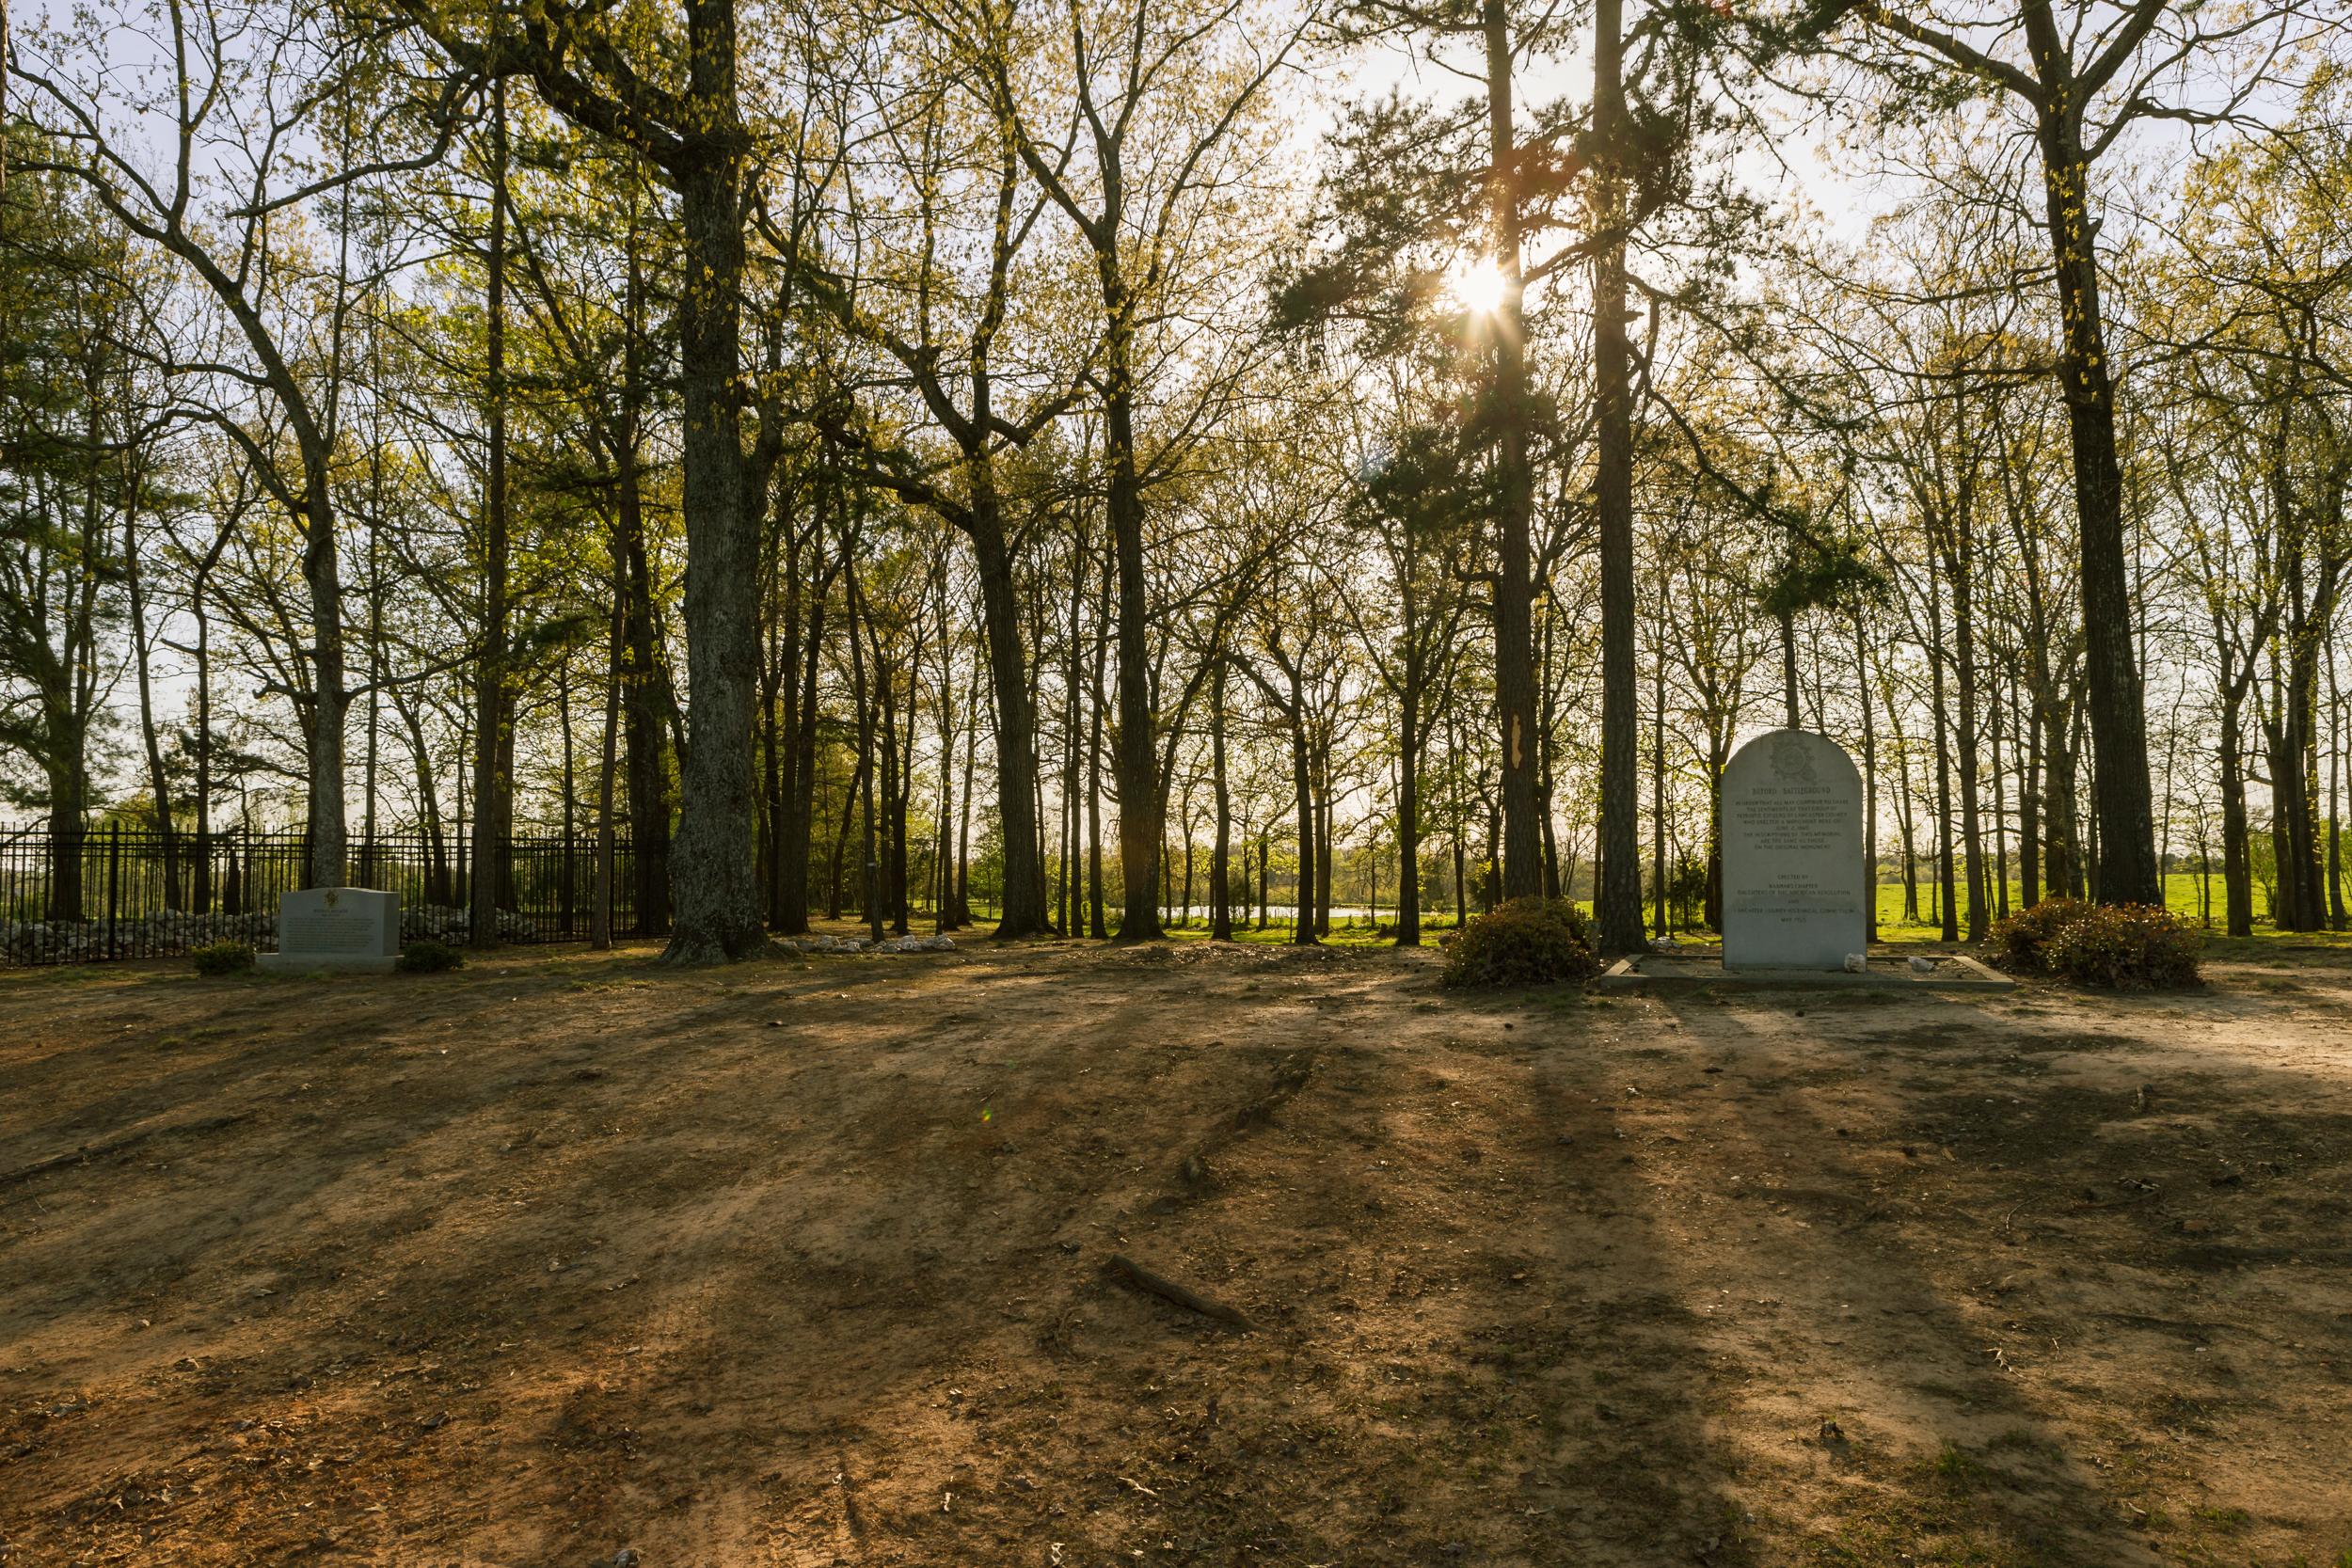 buford battleground massacre monument site